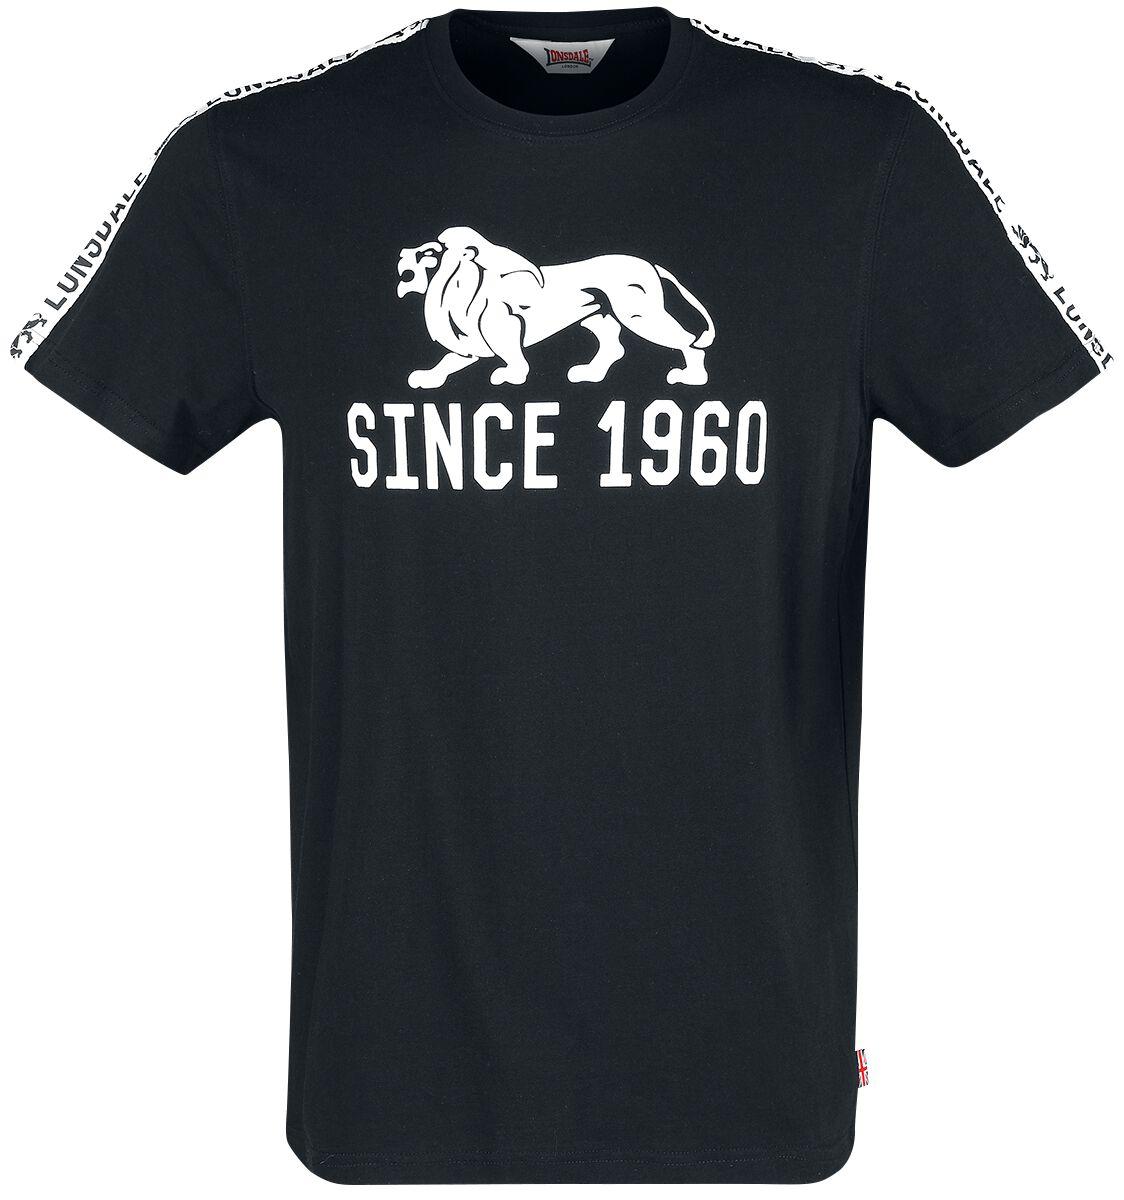 Image of Lonsdale London Bungay T-Shirt schwarz